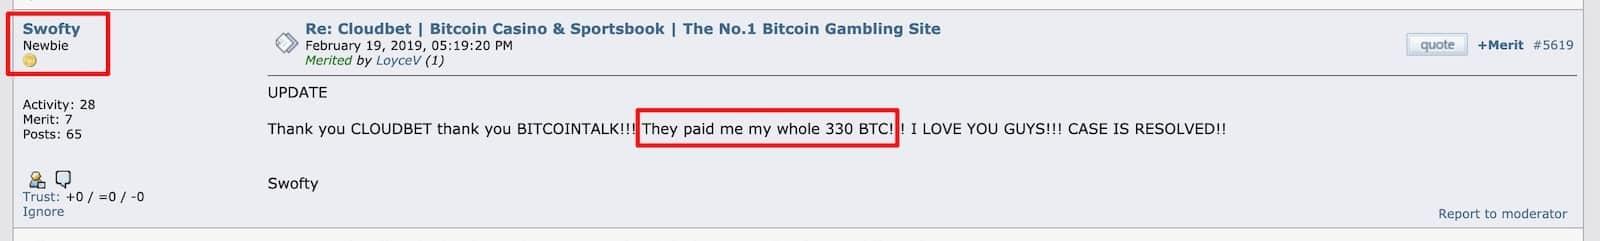 Swofty case 330BTC cloudbet payout dispute on bitcointalk